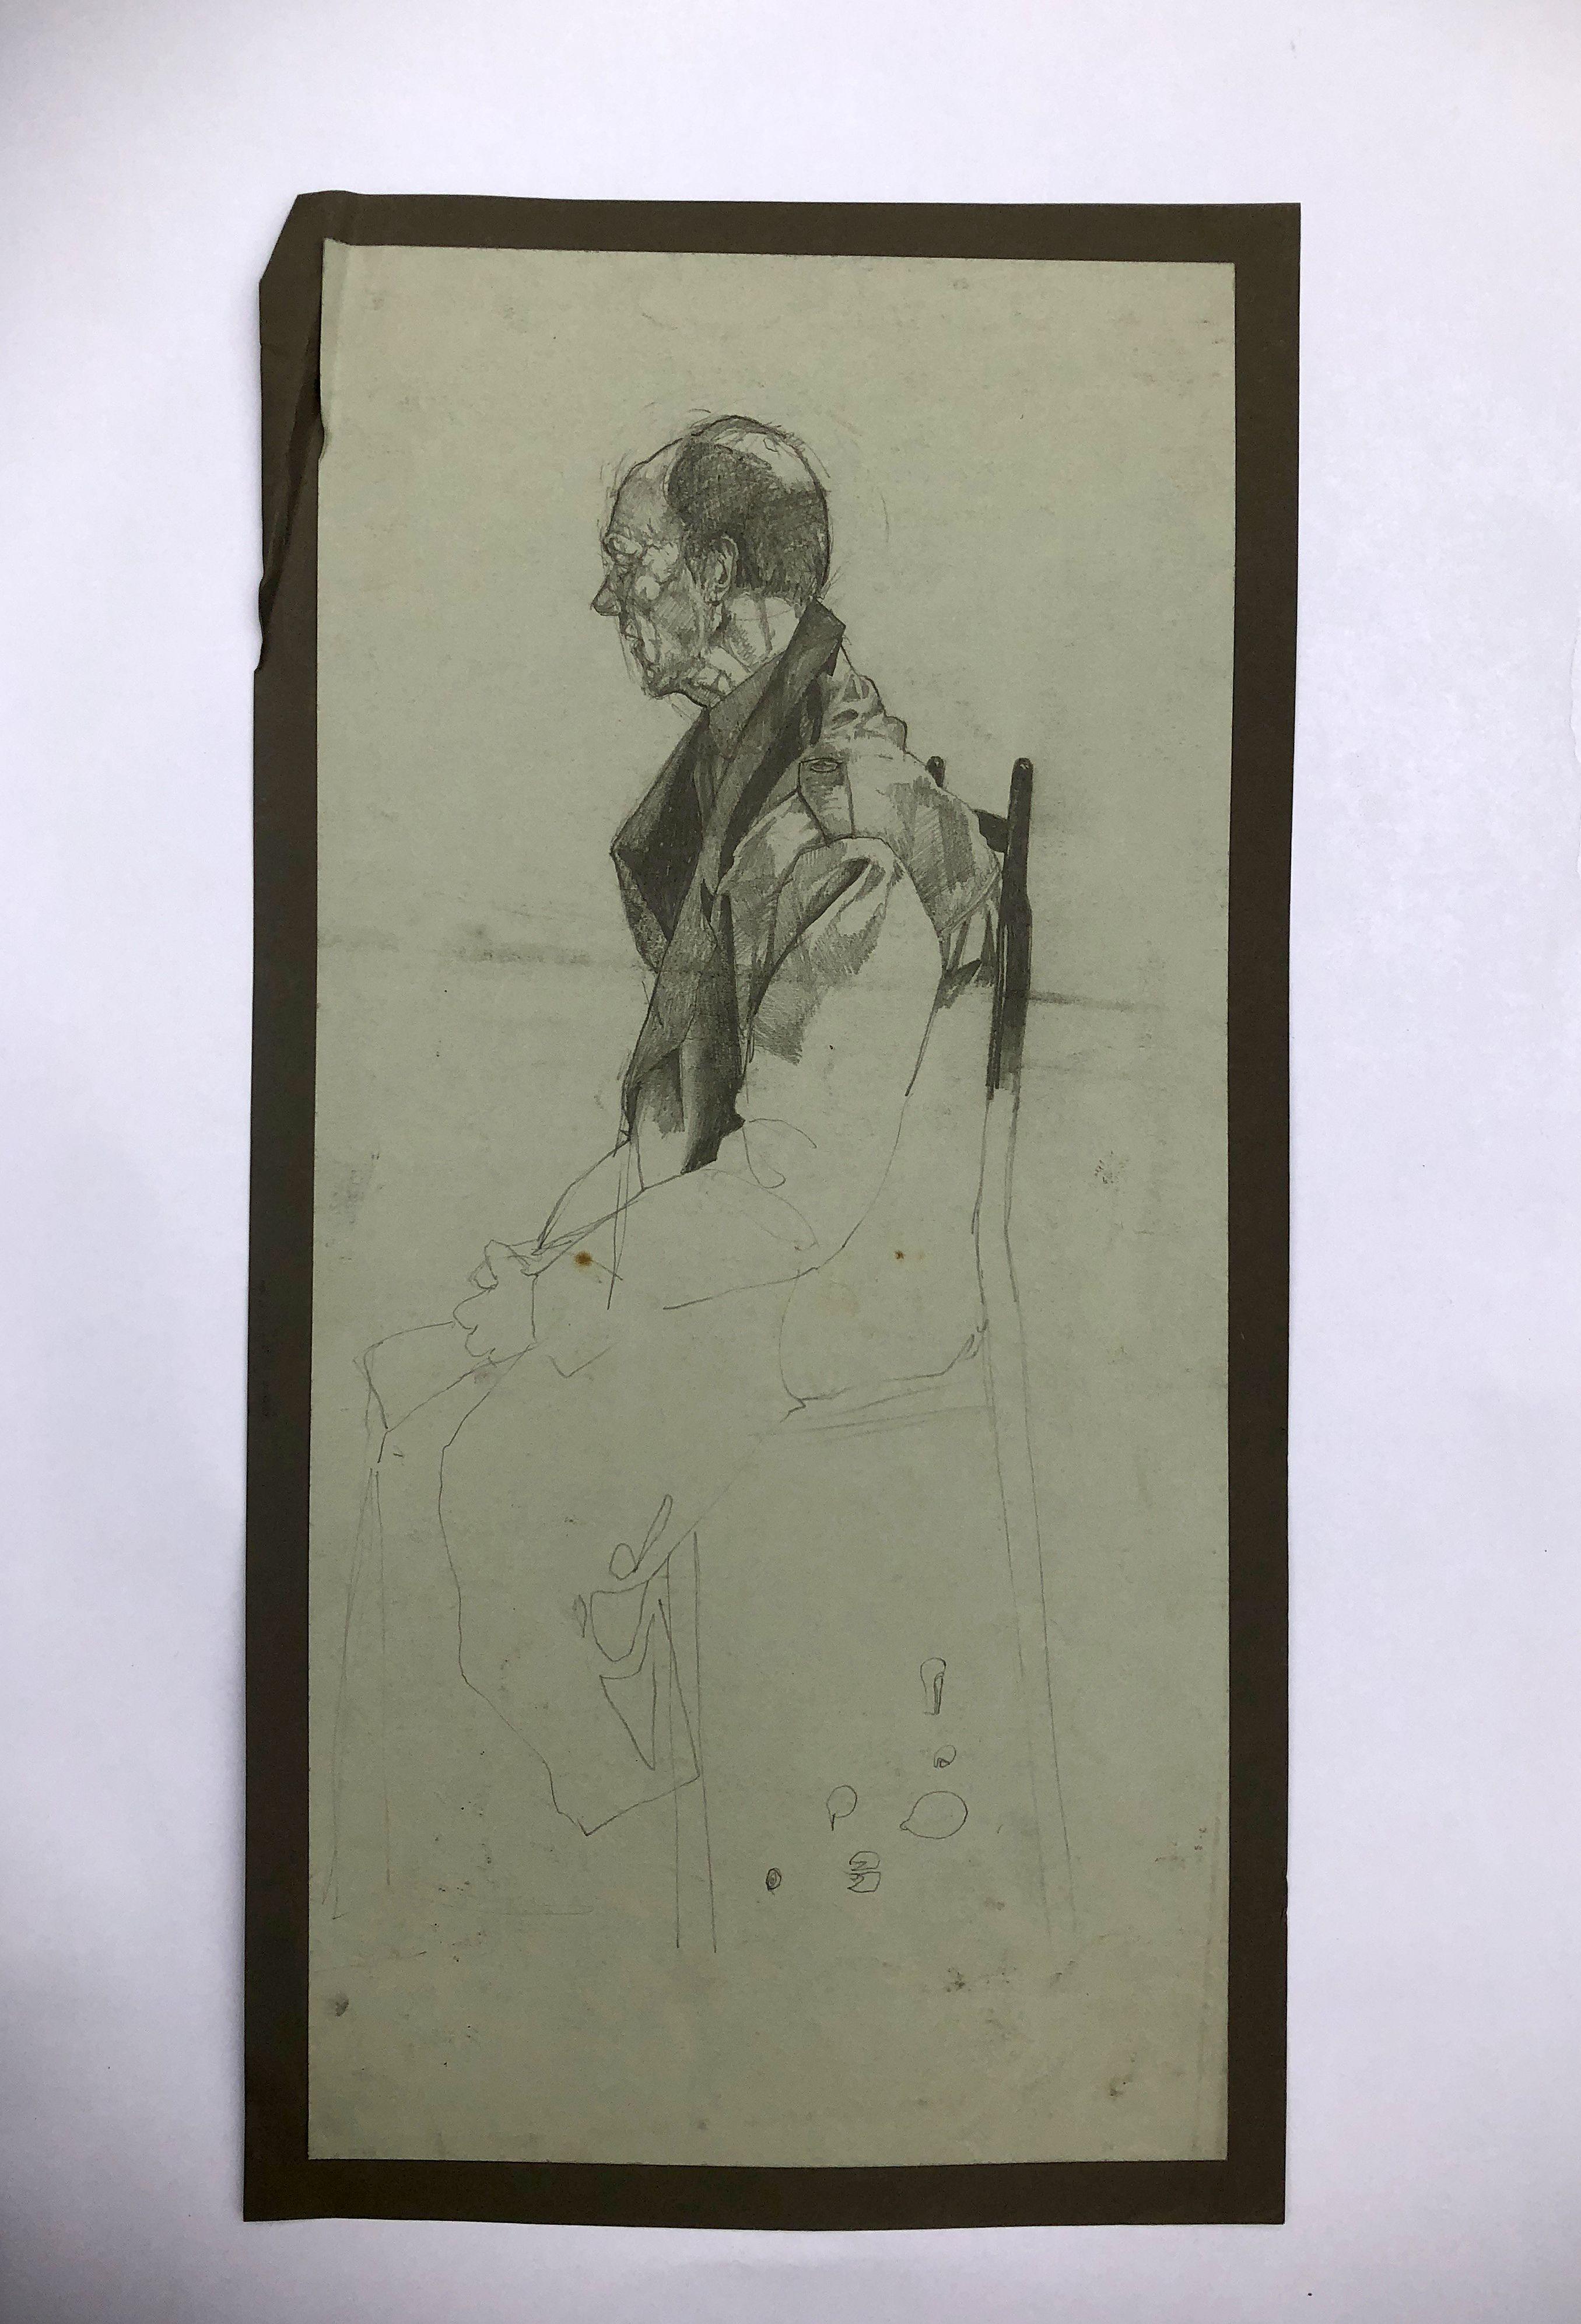 Edinburgh art school life drawing class 1980 84 art